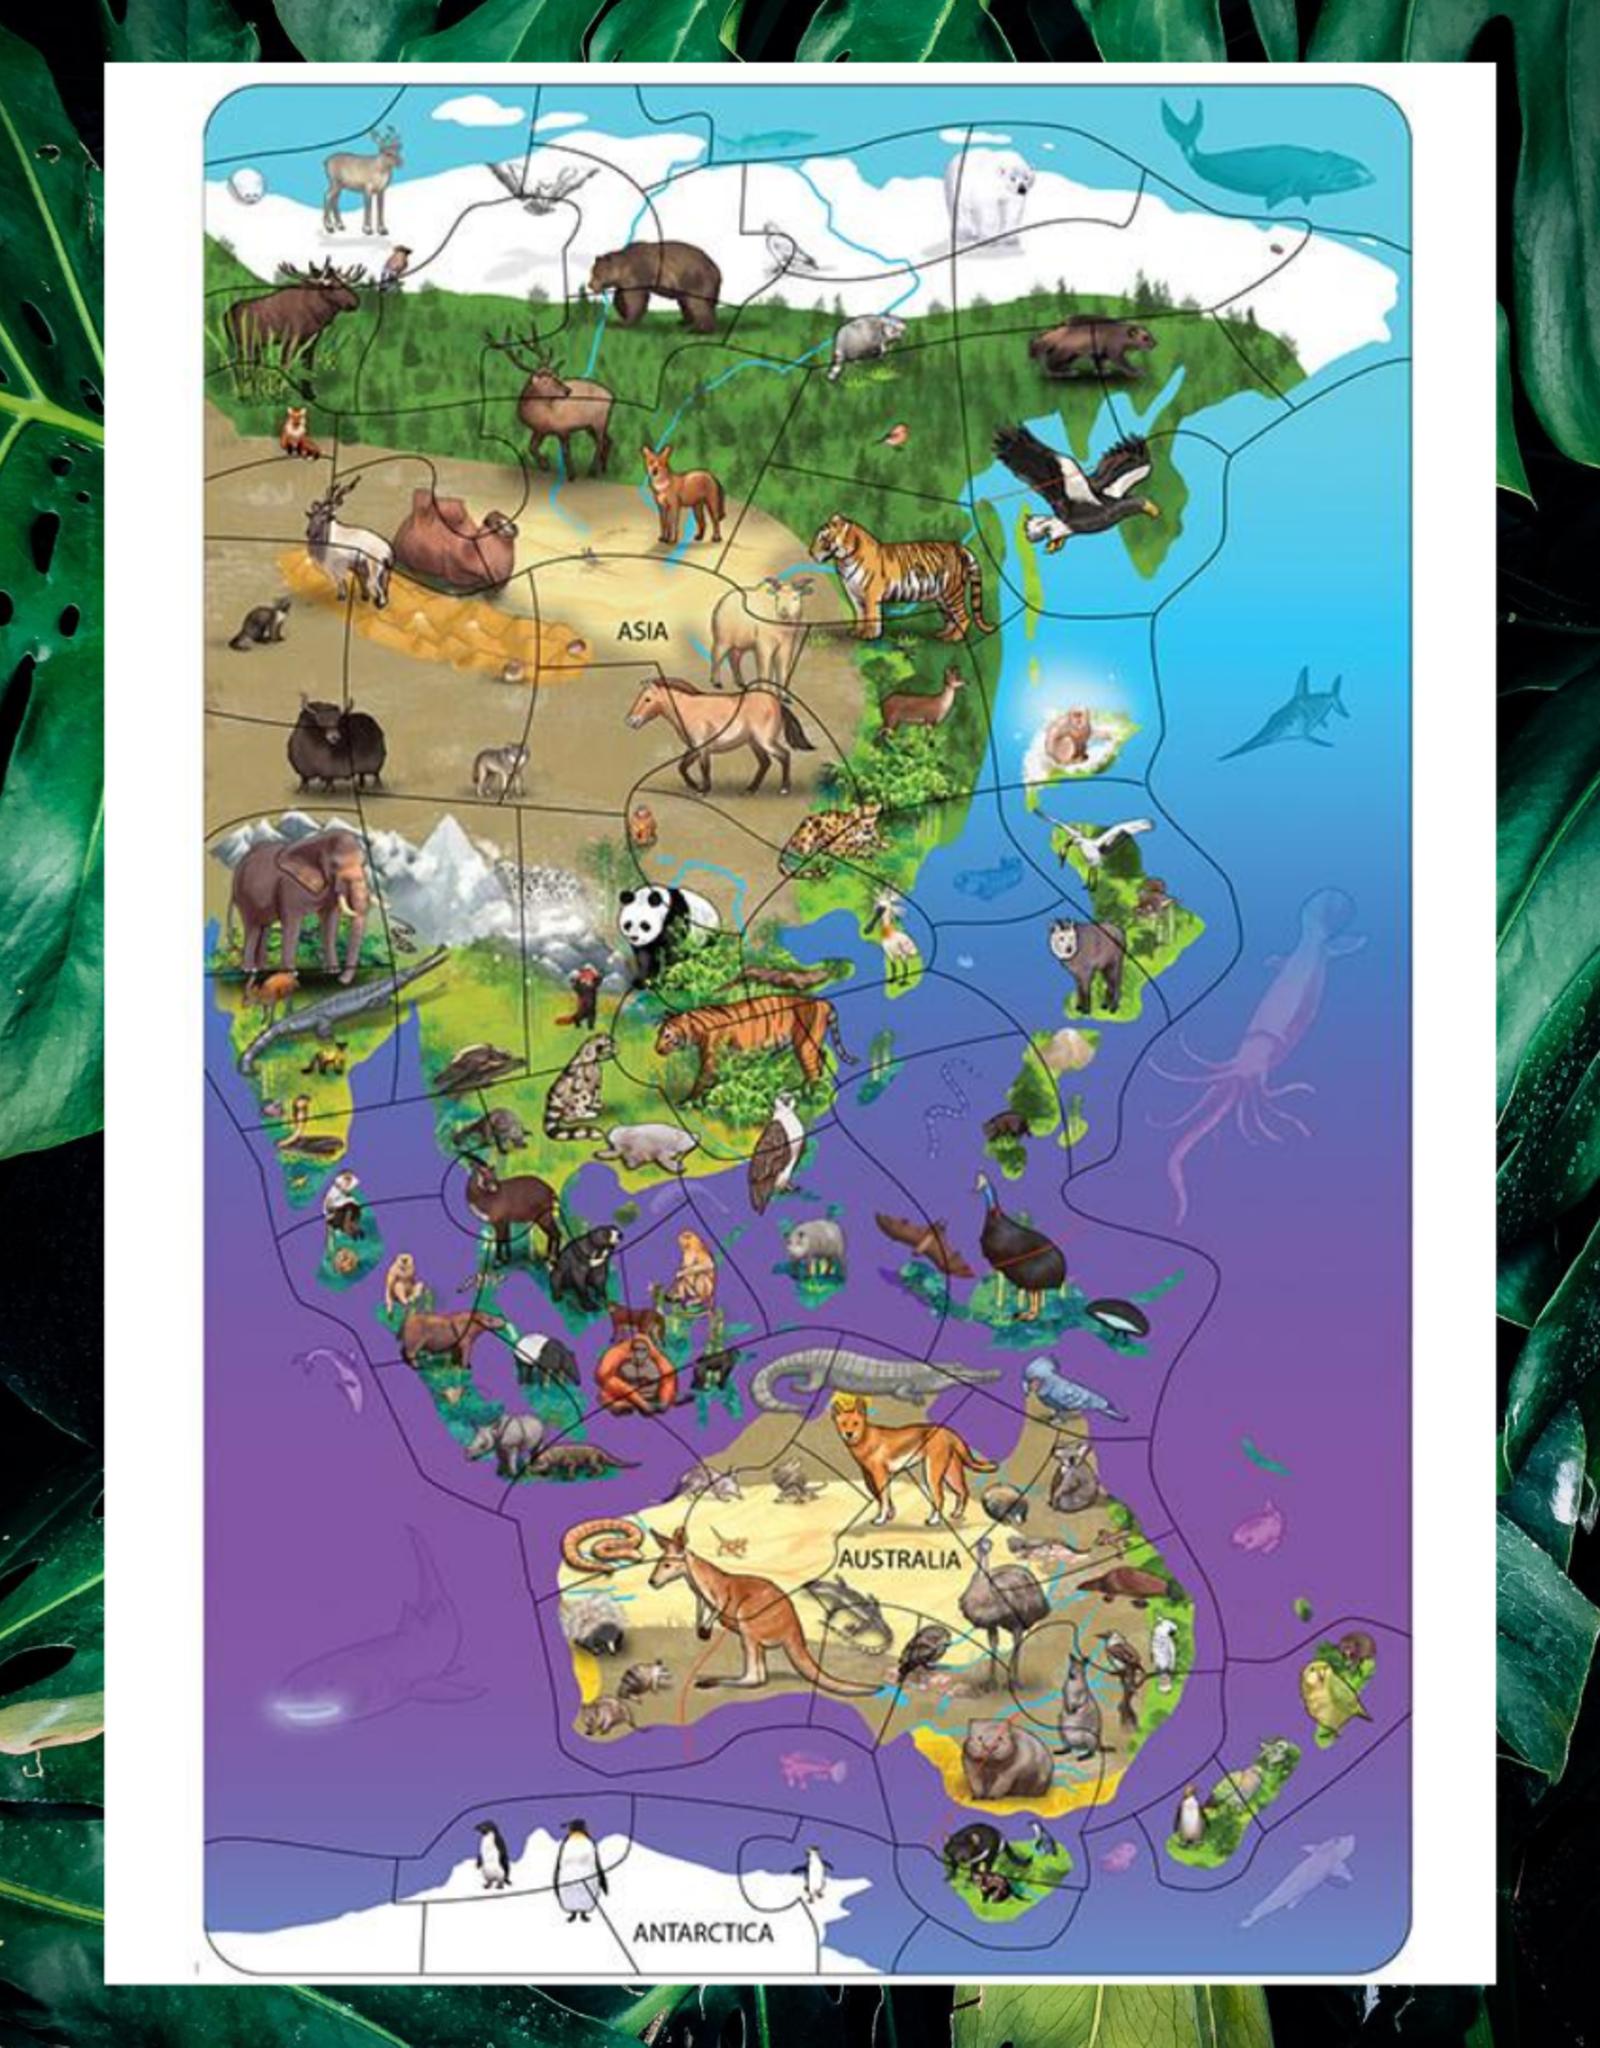 DOWLING MAGNET ASIA & AUSTRALIA WILDLIFE MAP